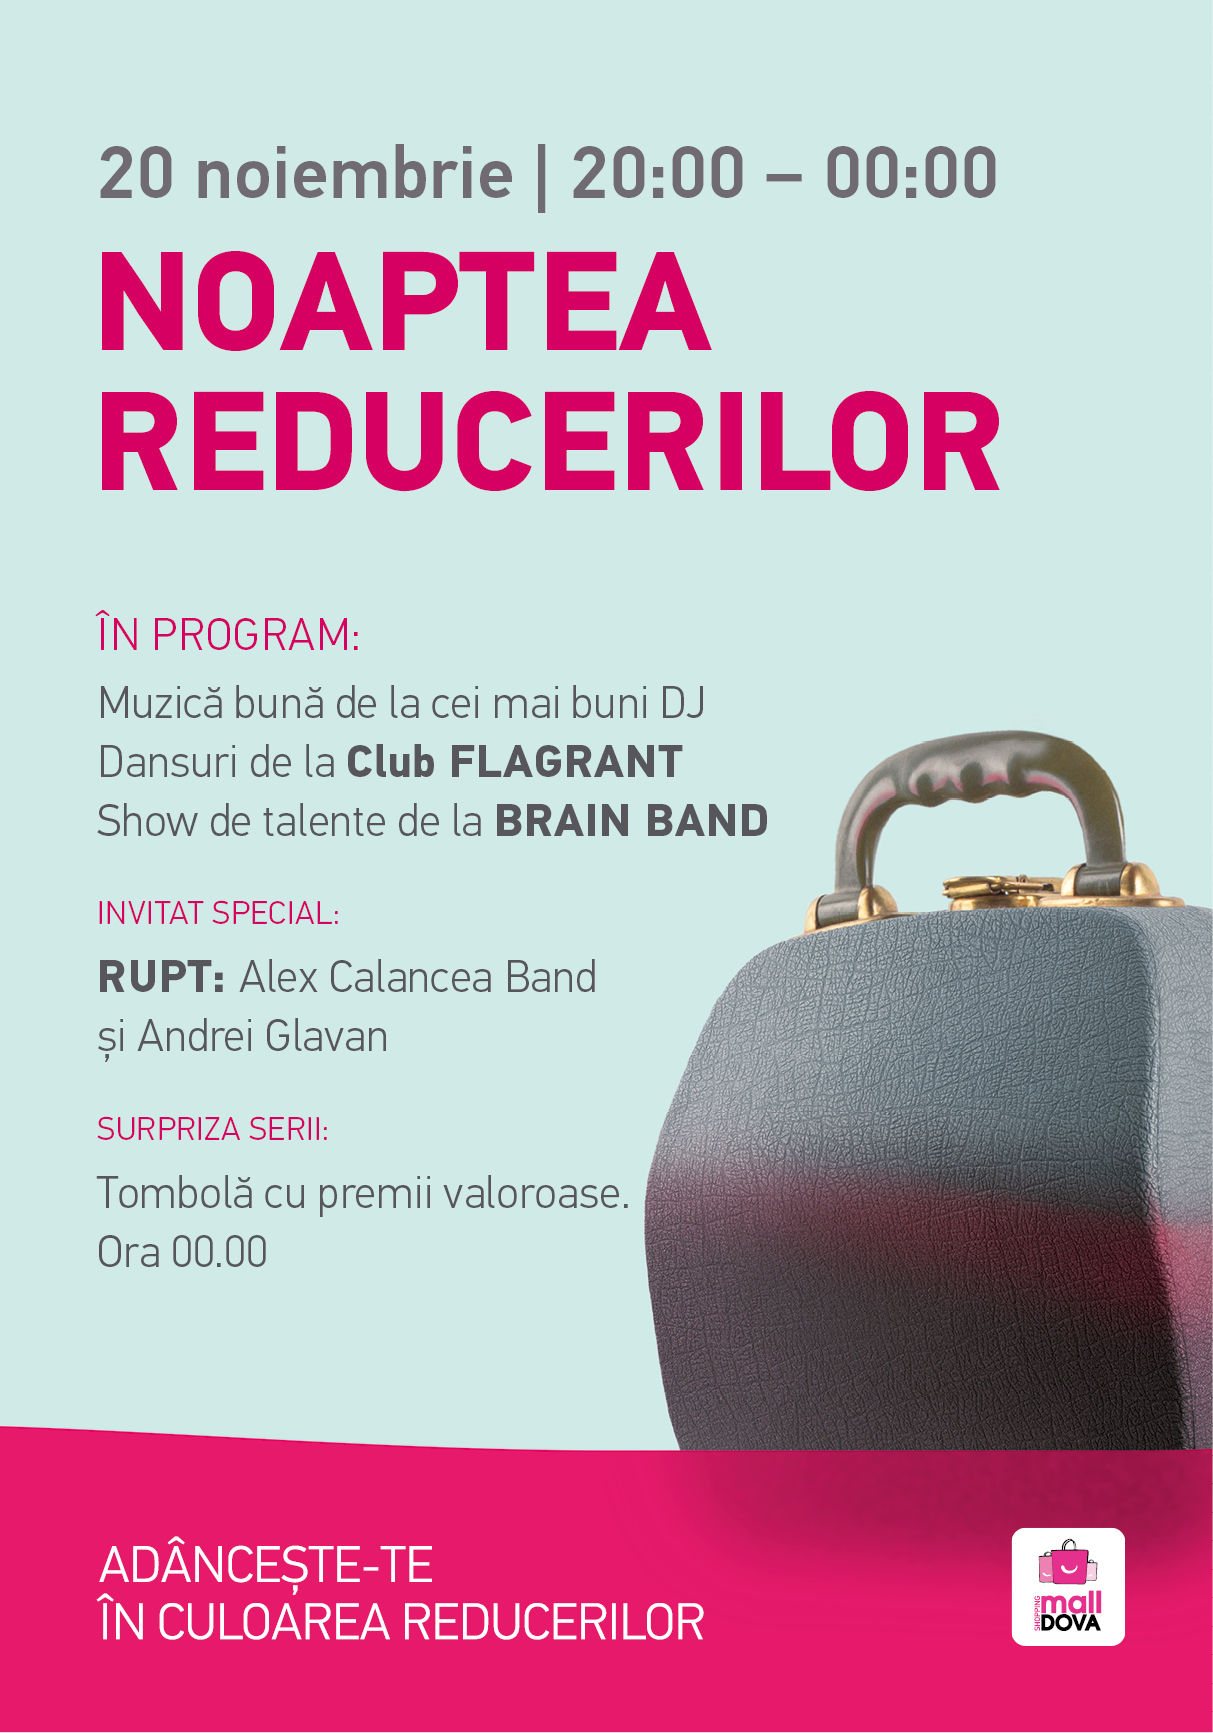 NSP Nov 2015_Poster_program